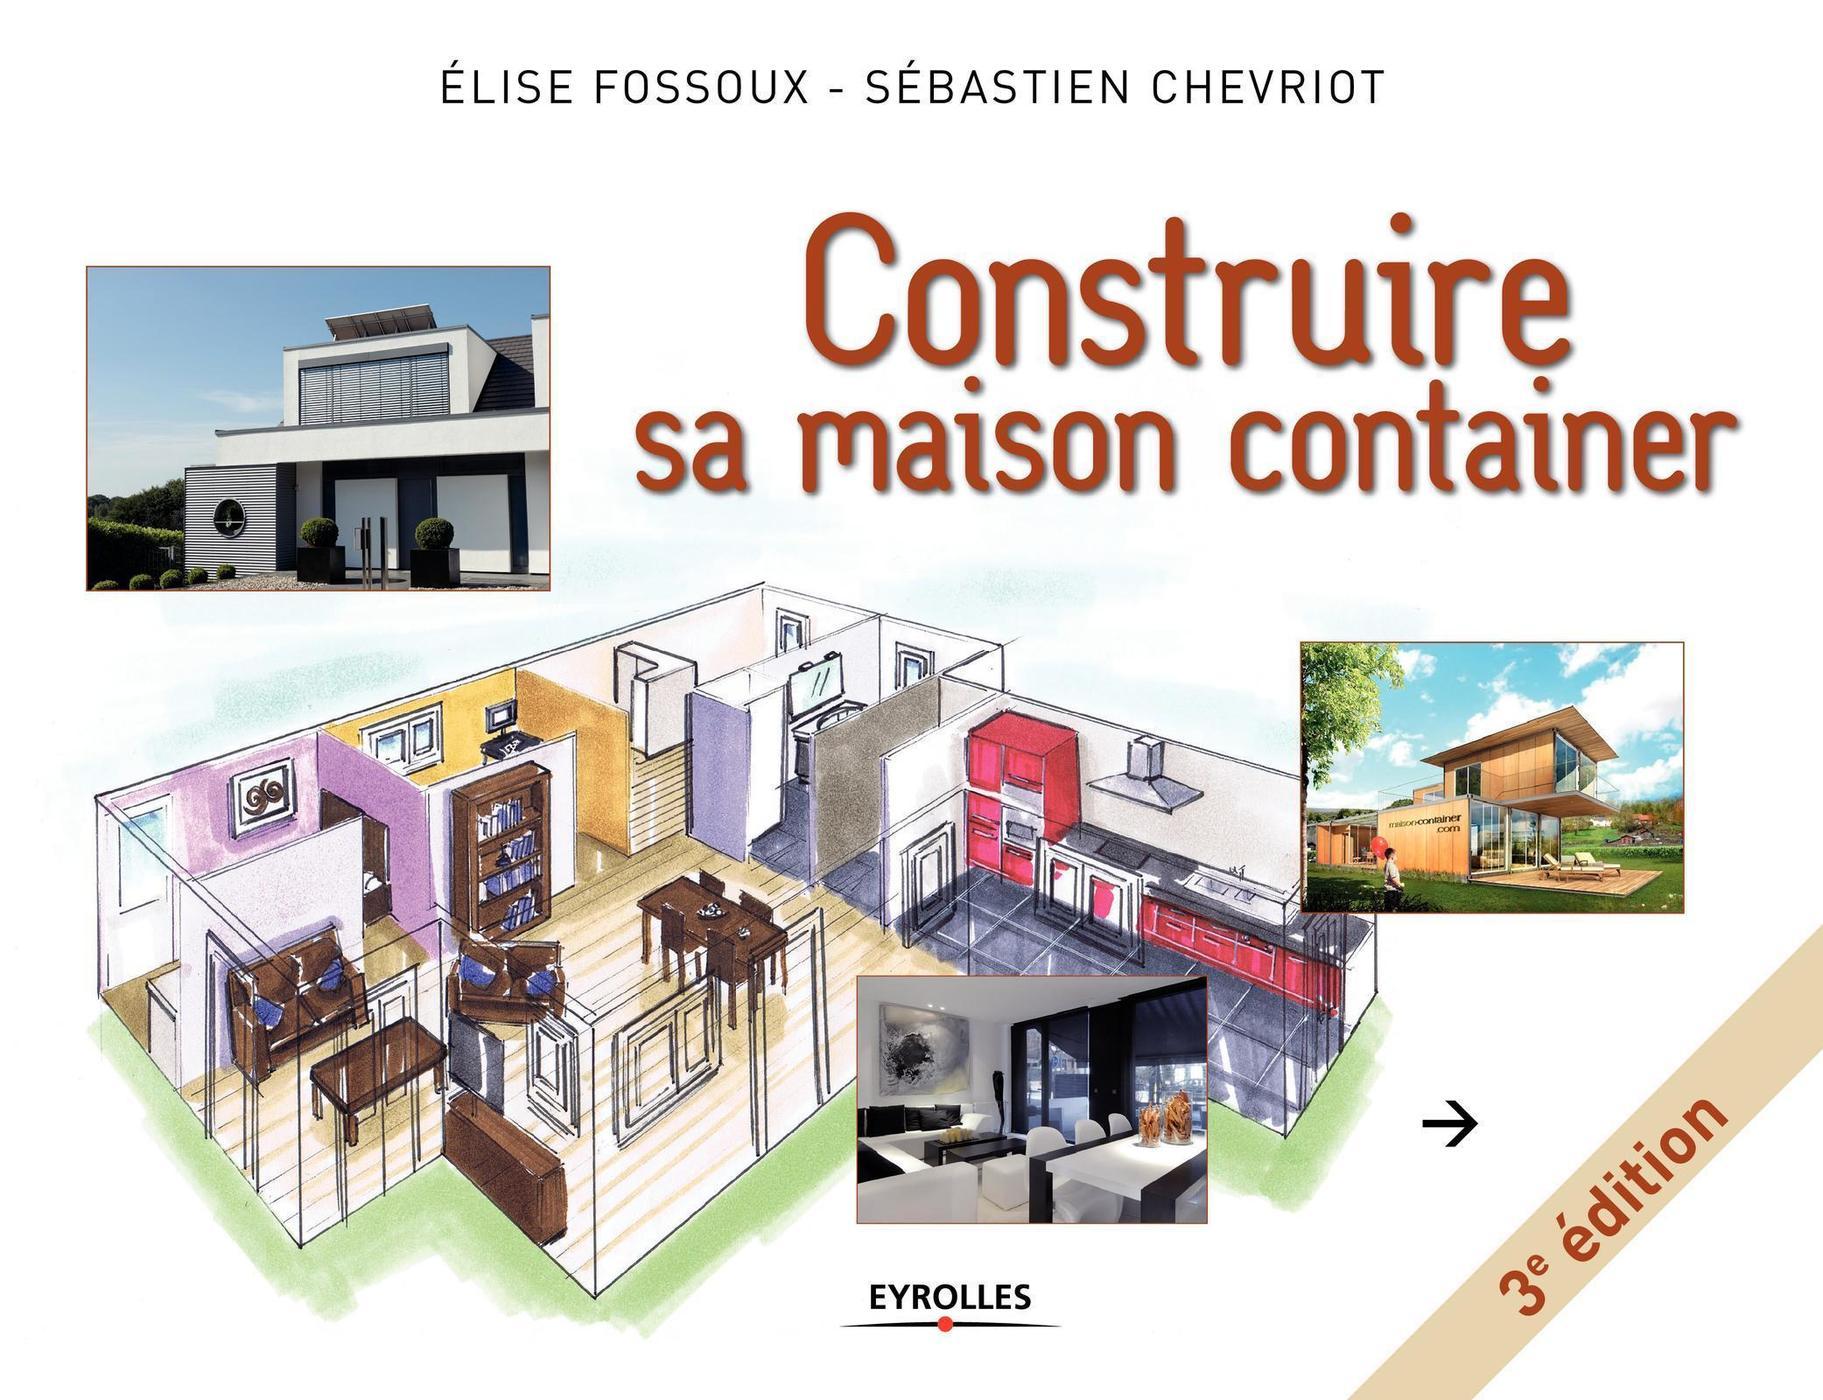 Construire Sa Maison Container   S.Chevriot, E.Fossoux   3ème...    Librairie Eyrolles